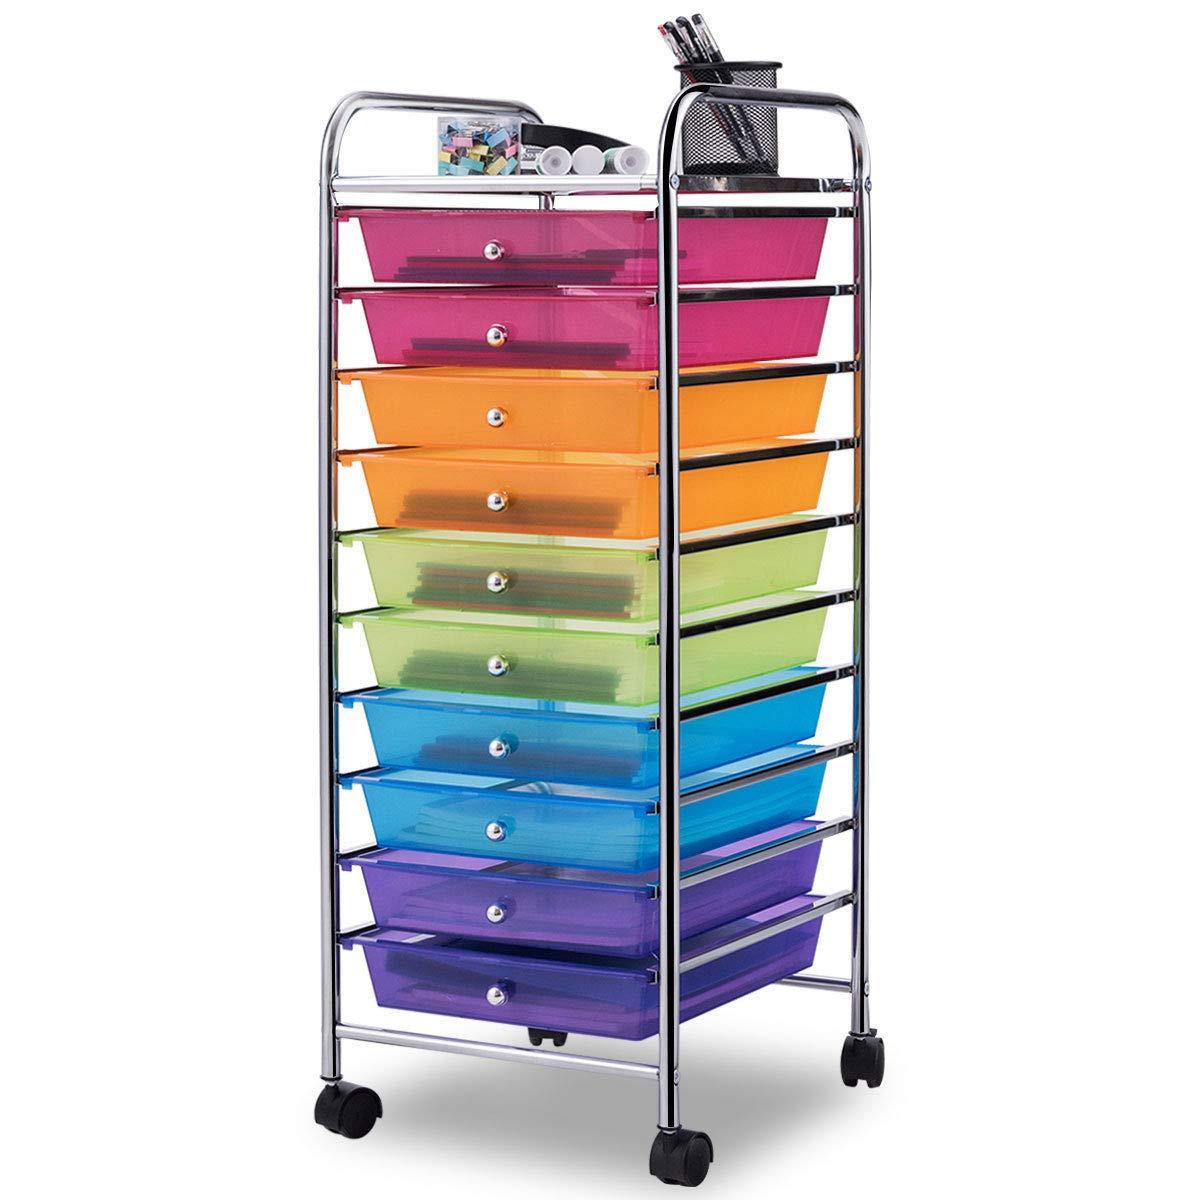 Giantex 10 Drawer Rolling Storage Cart Scrapbook Paper Office School Organizer (Multicolor)